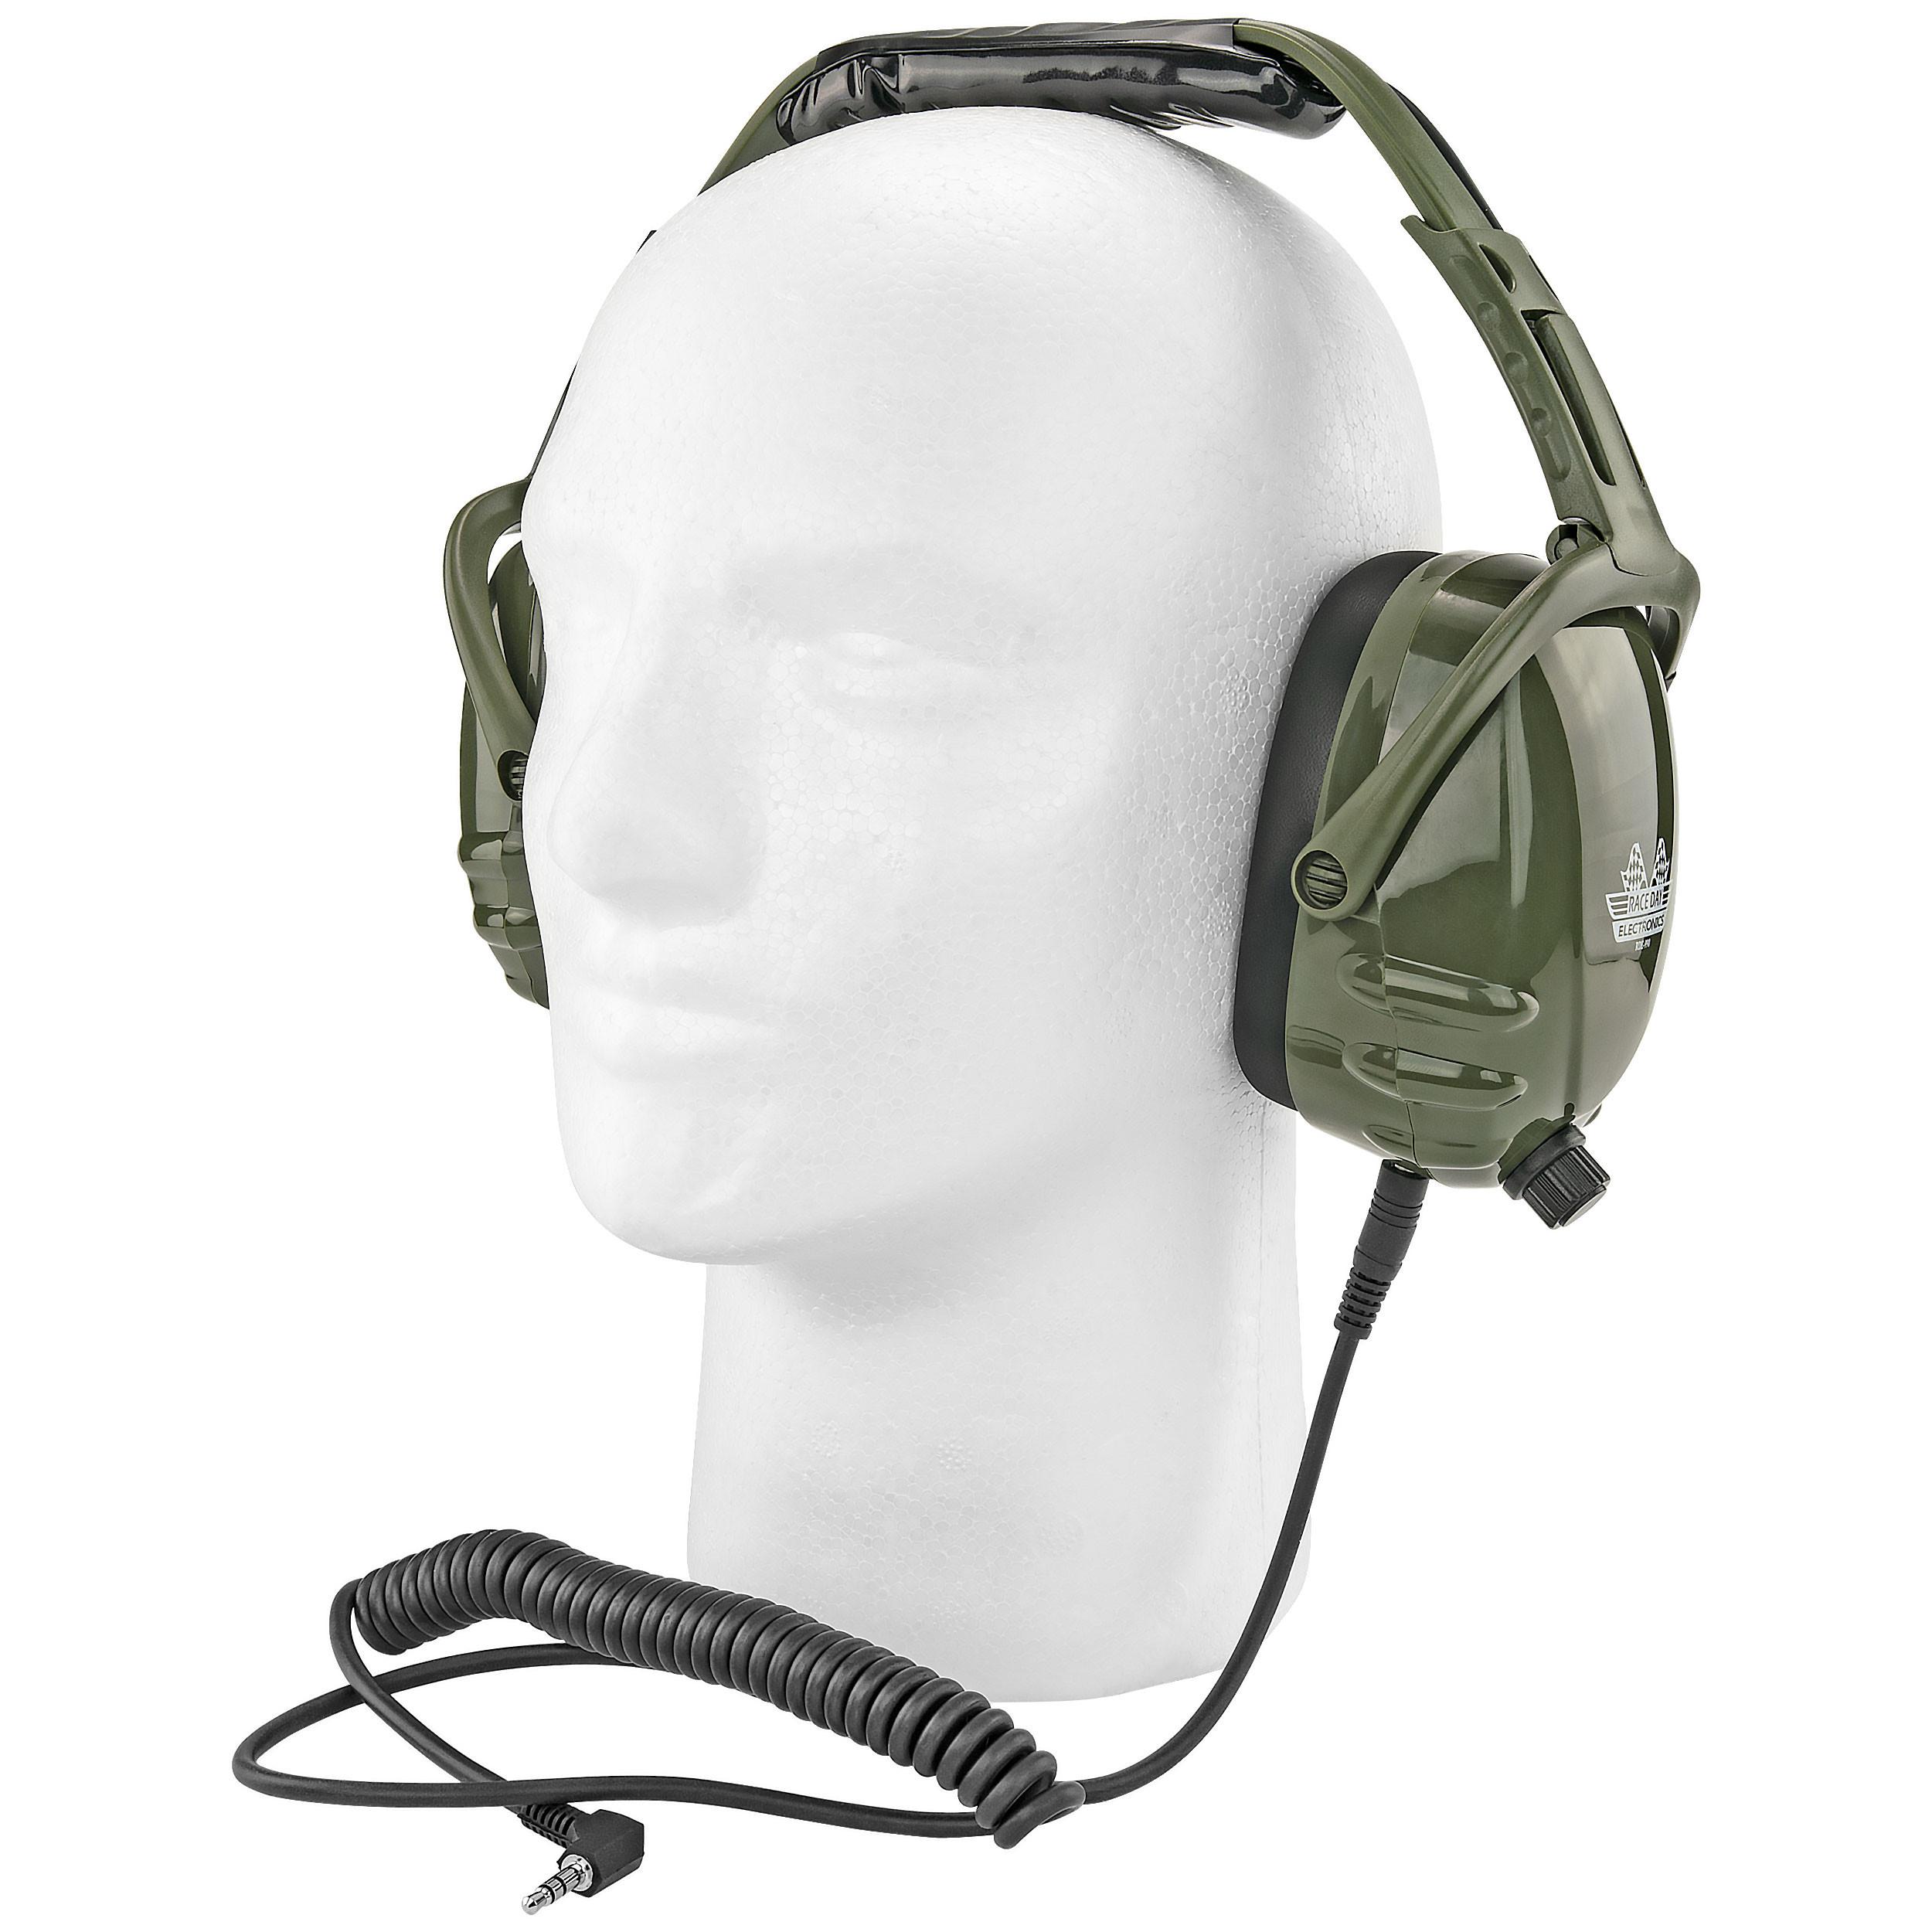 Earmuff Headphones - iPhone & Scanner Compatible - Great for Impact Sports Like Hunting, Gun Range, NASCAR Races, Construction, Work, etc.